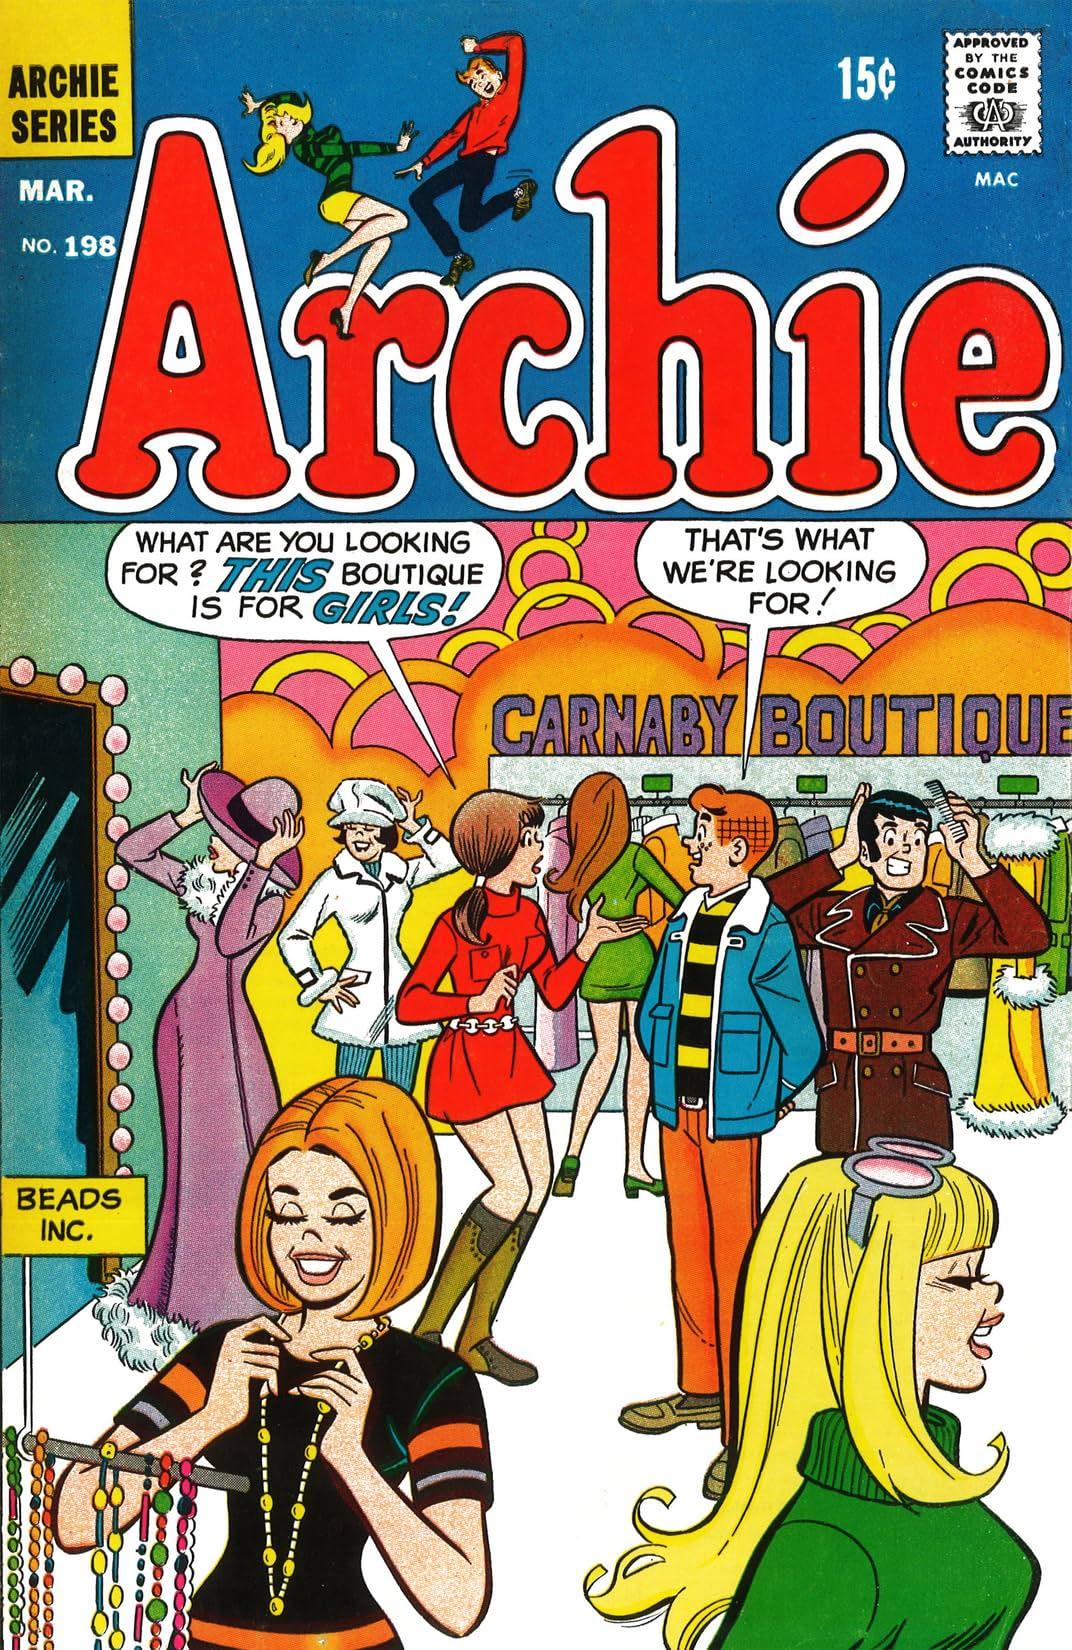 Archie #198